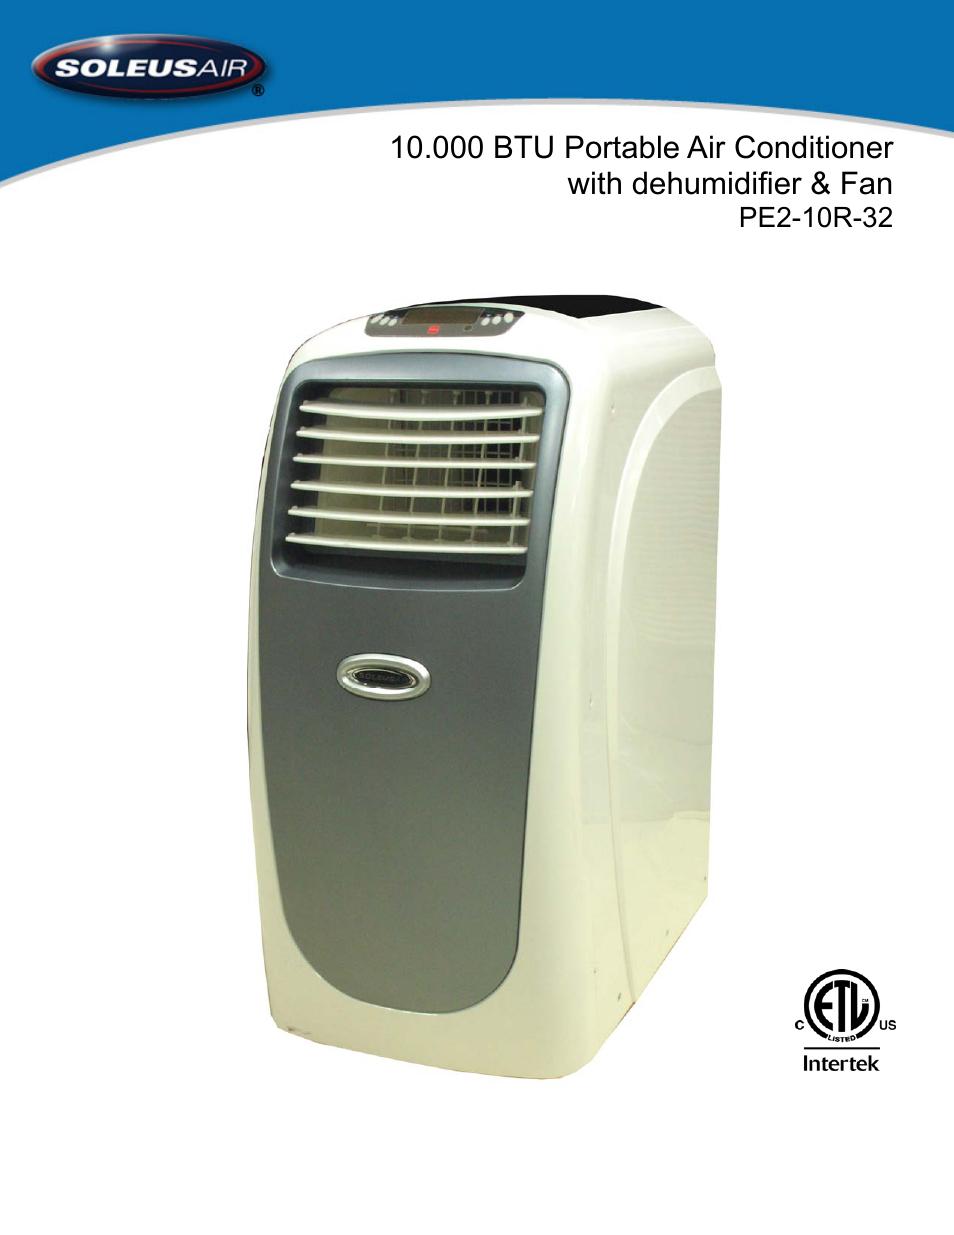 soleusair pe2 10r 32 user manual 16 pages rh manualsdir com soleus air dehumidifier manual hmt-d70eip-a soleus air dehumidifier manual gl-deh-70eip